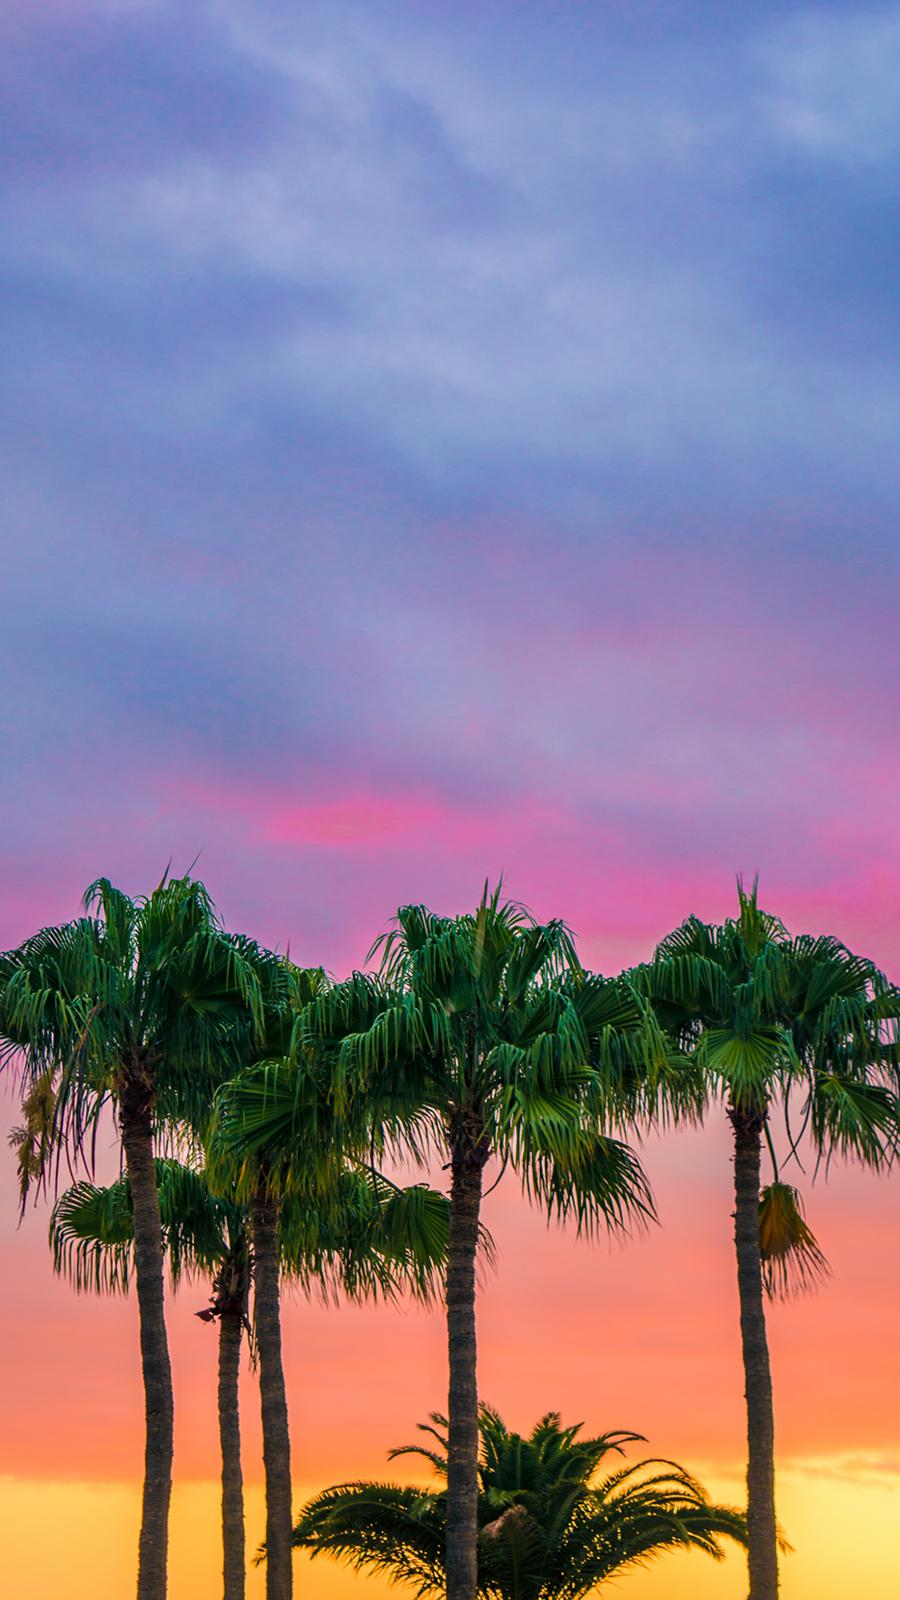 Sky, Sunset, Plam 4K HD Wallpapers Free Downoad